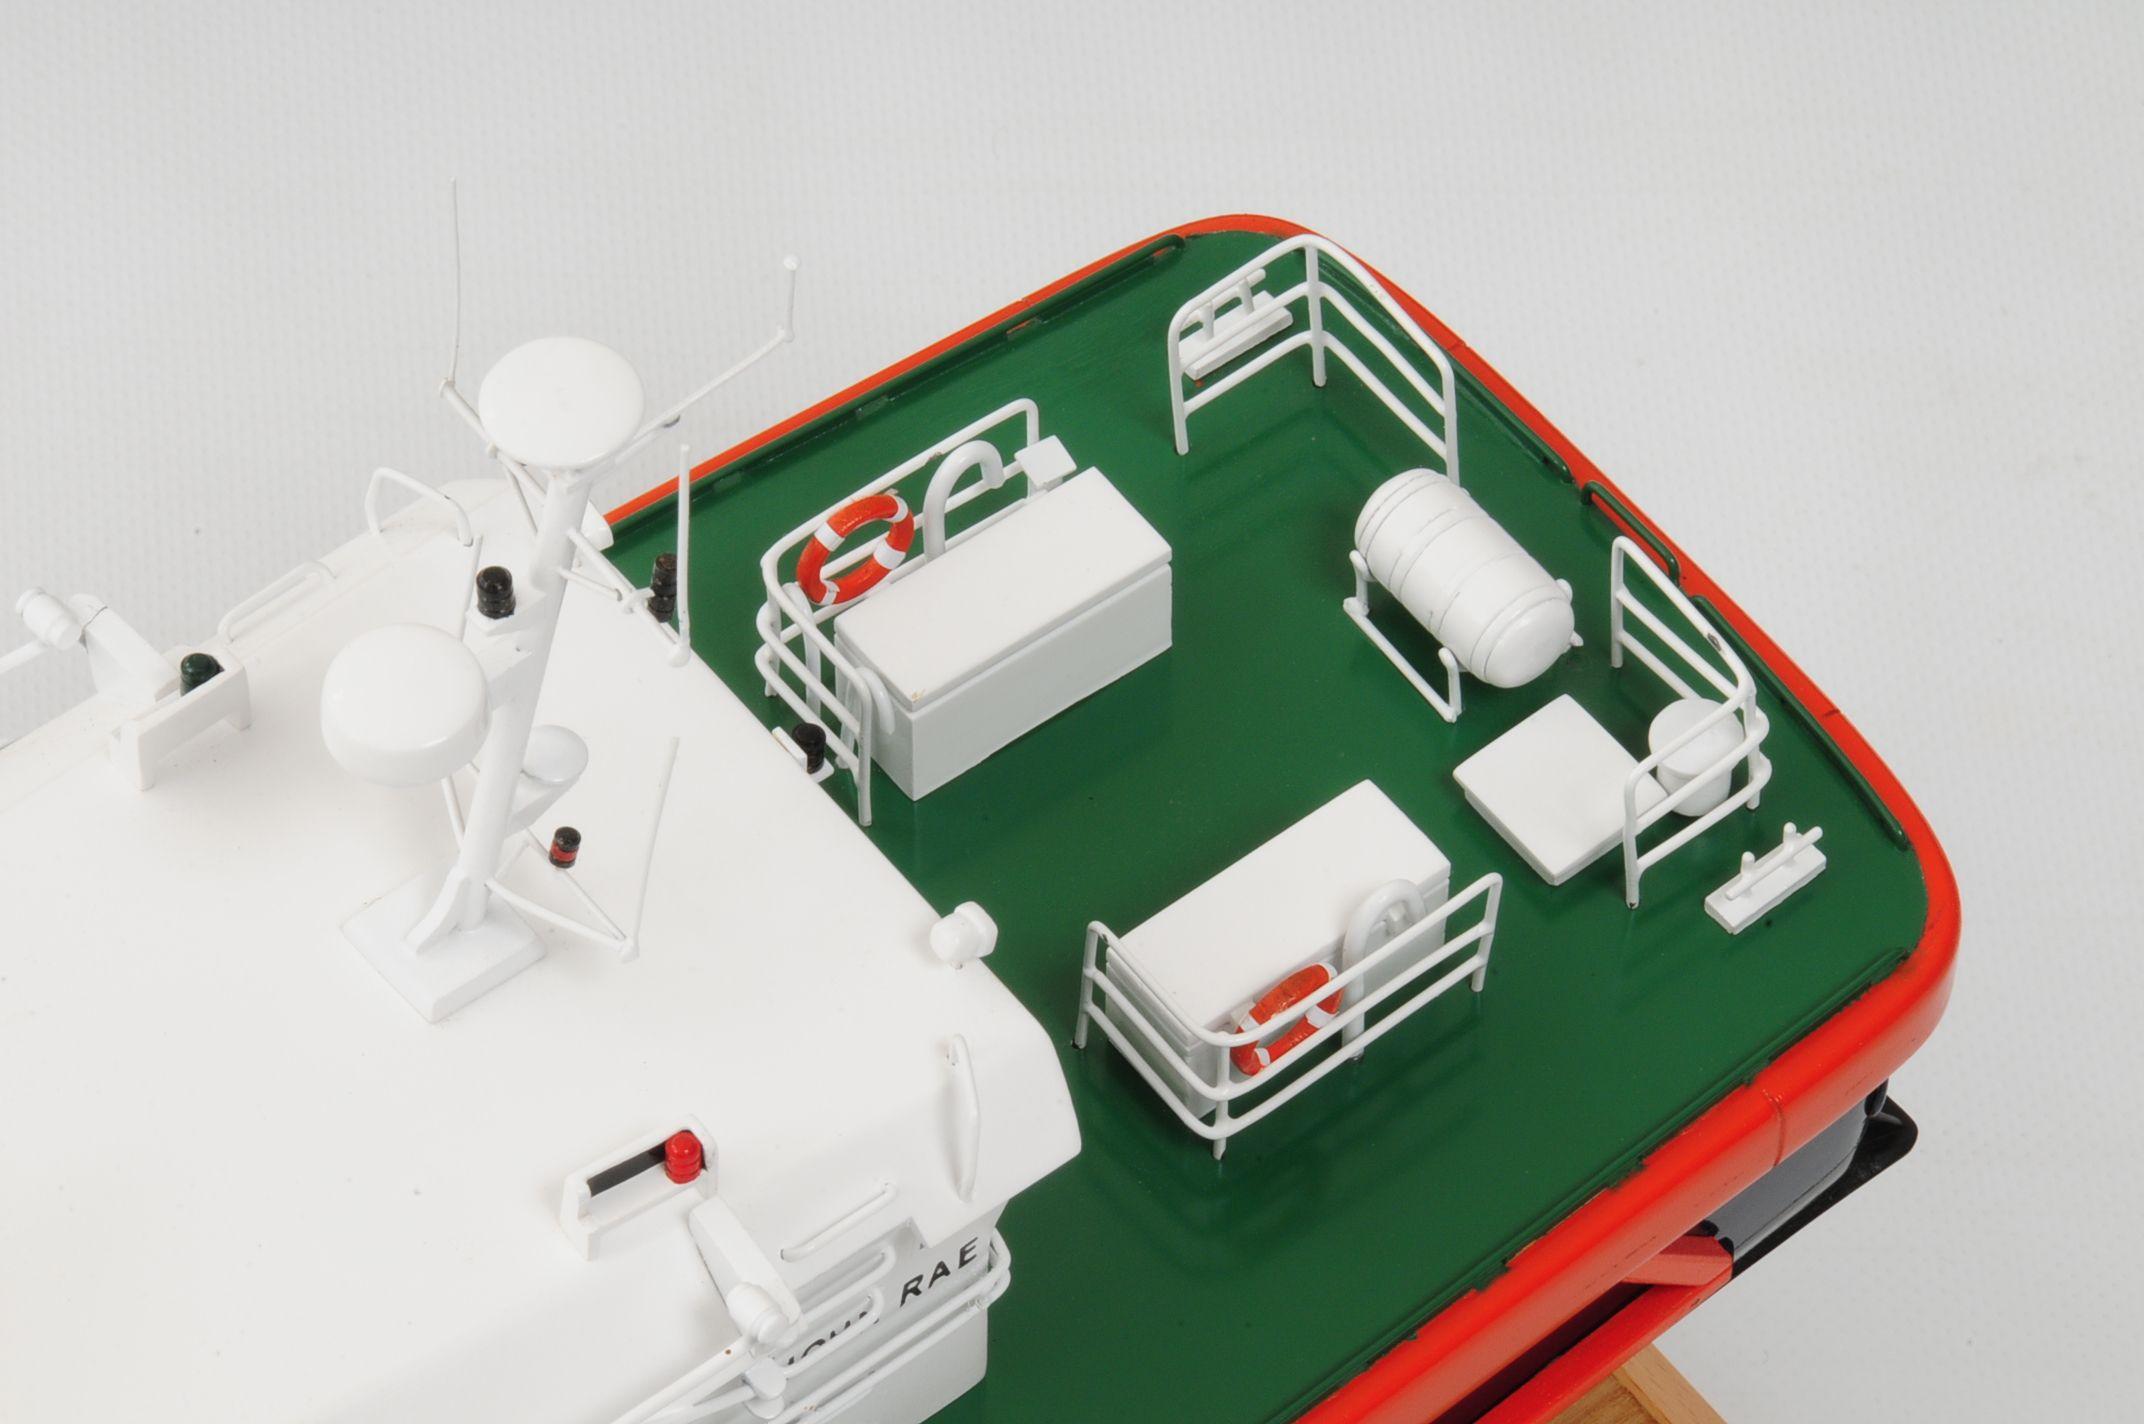 1247-6609-Orkney-Pilot-Vessel